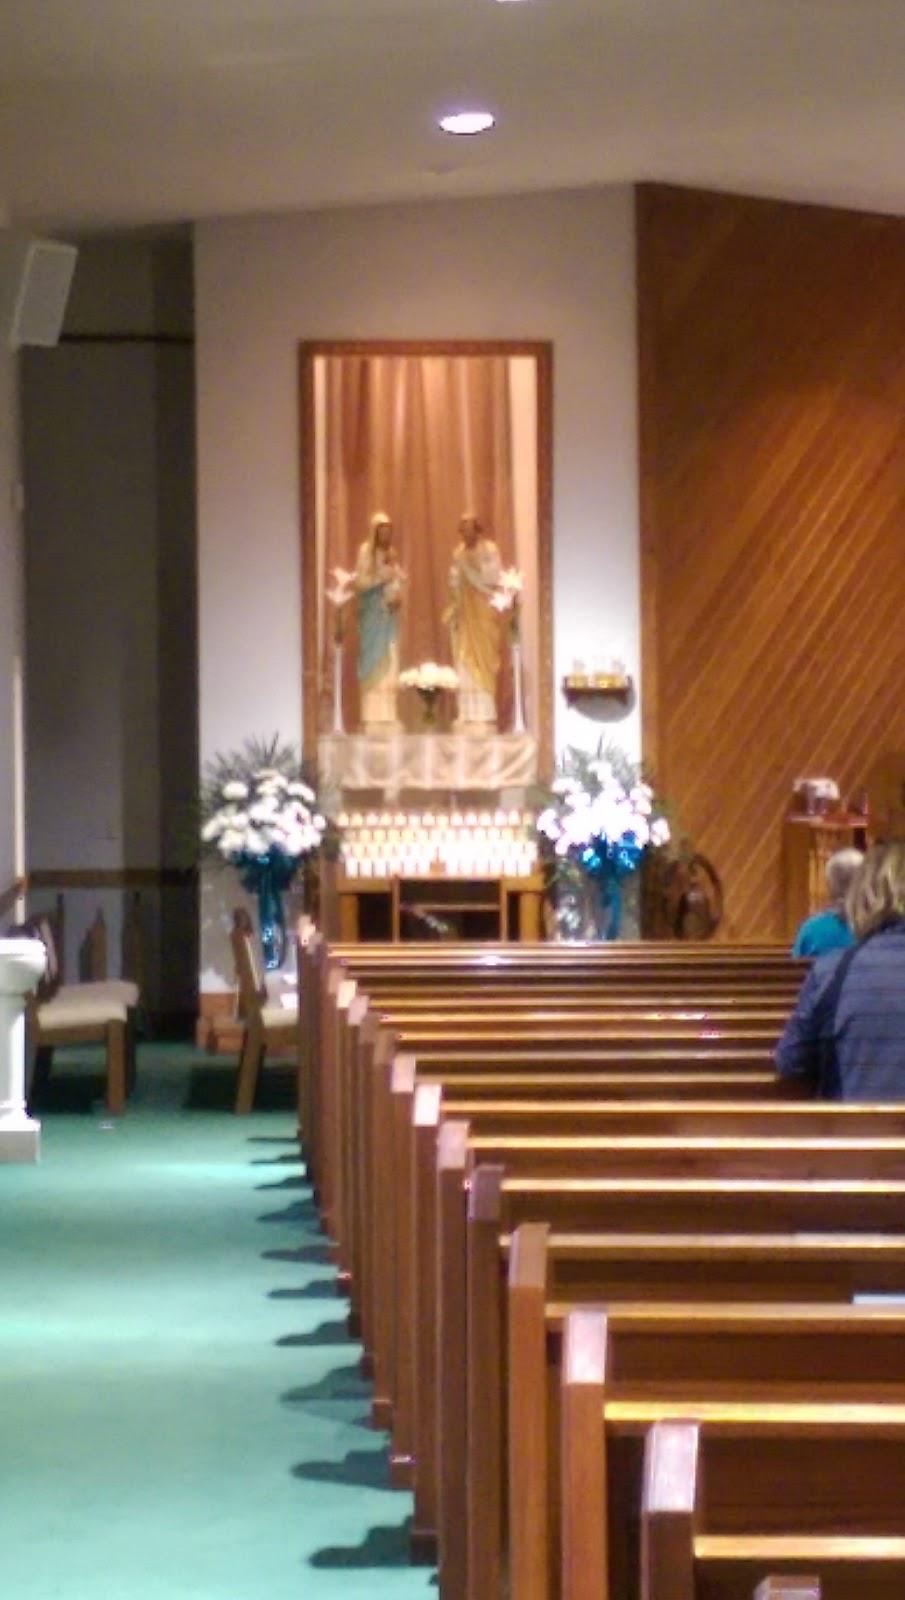 Saint Gregory Barbarigo Catholic Church - church    Photo 3 of 6   Address: 21 Cinder Rd, Garnerville, NY 10923, USA   Phone: (845) 947-1873